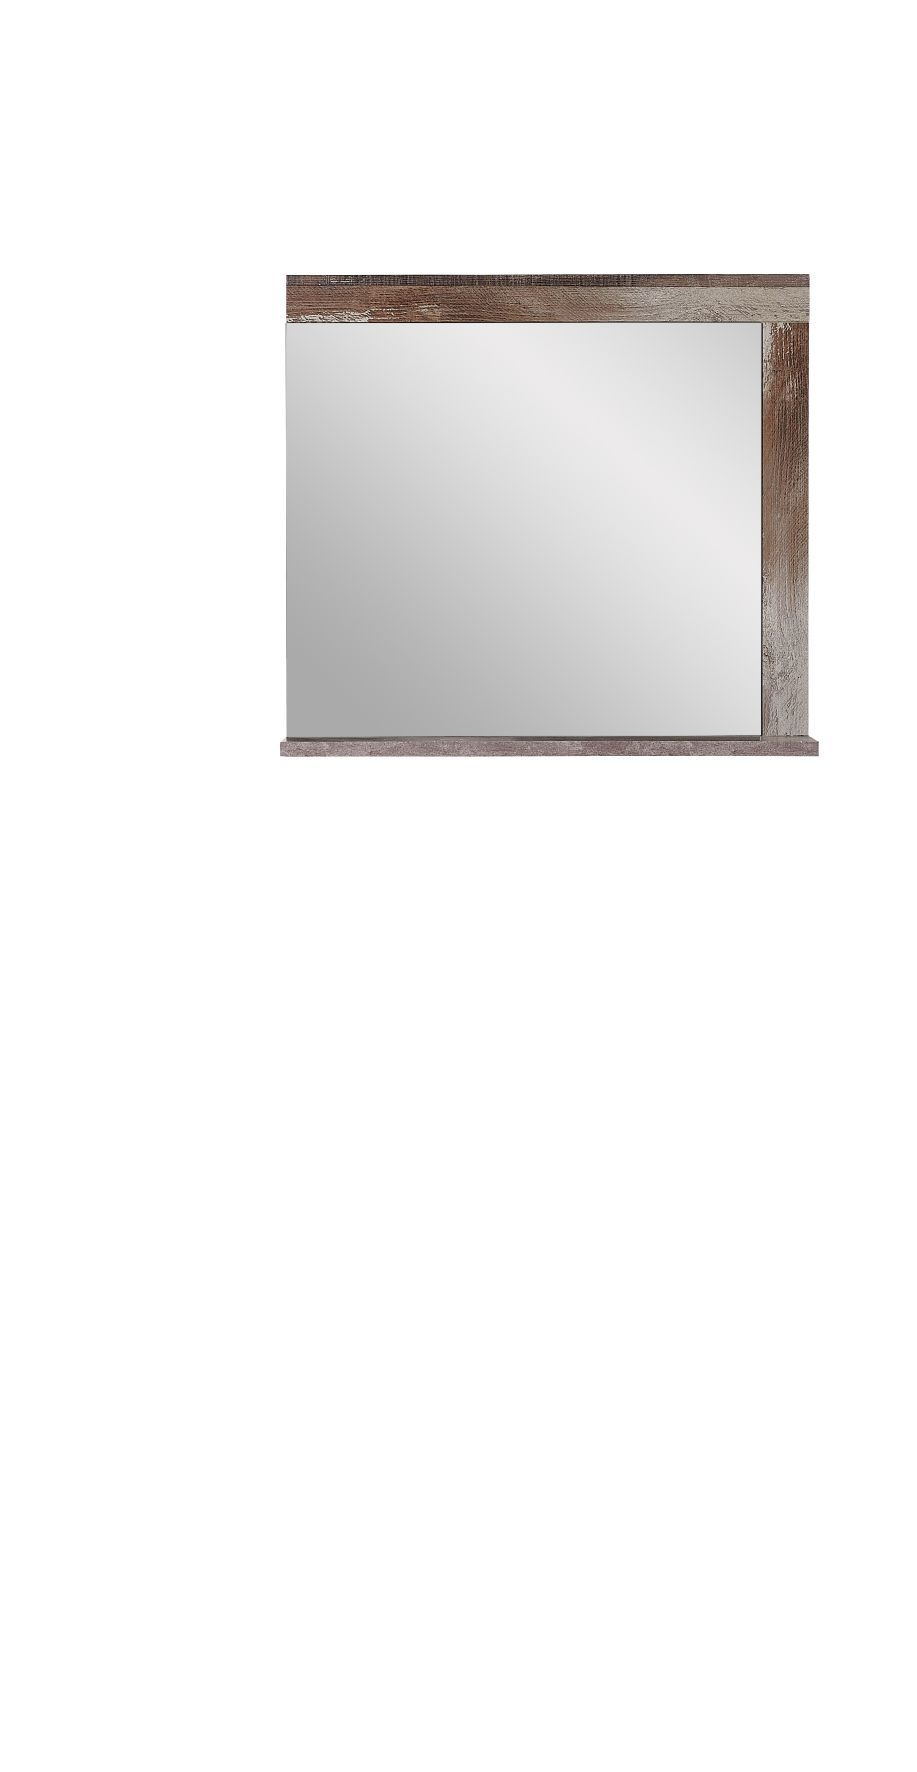 Oglinda decorativa din pal Krone Natur, L77xl70 cm